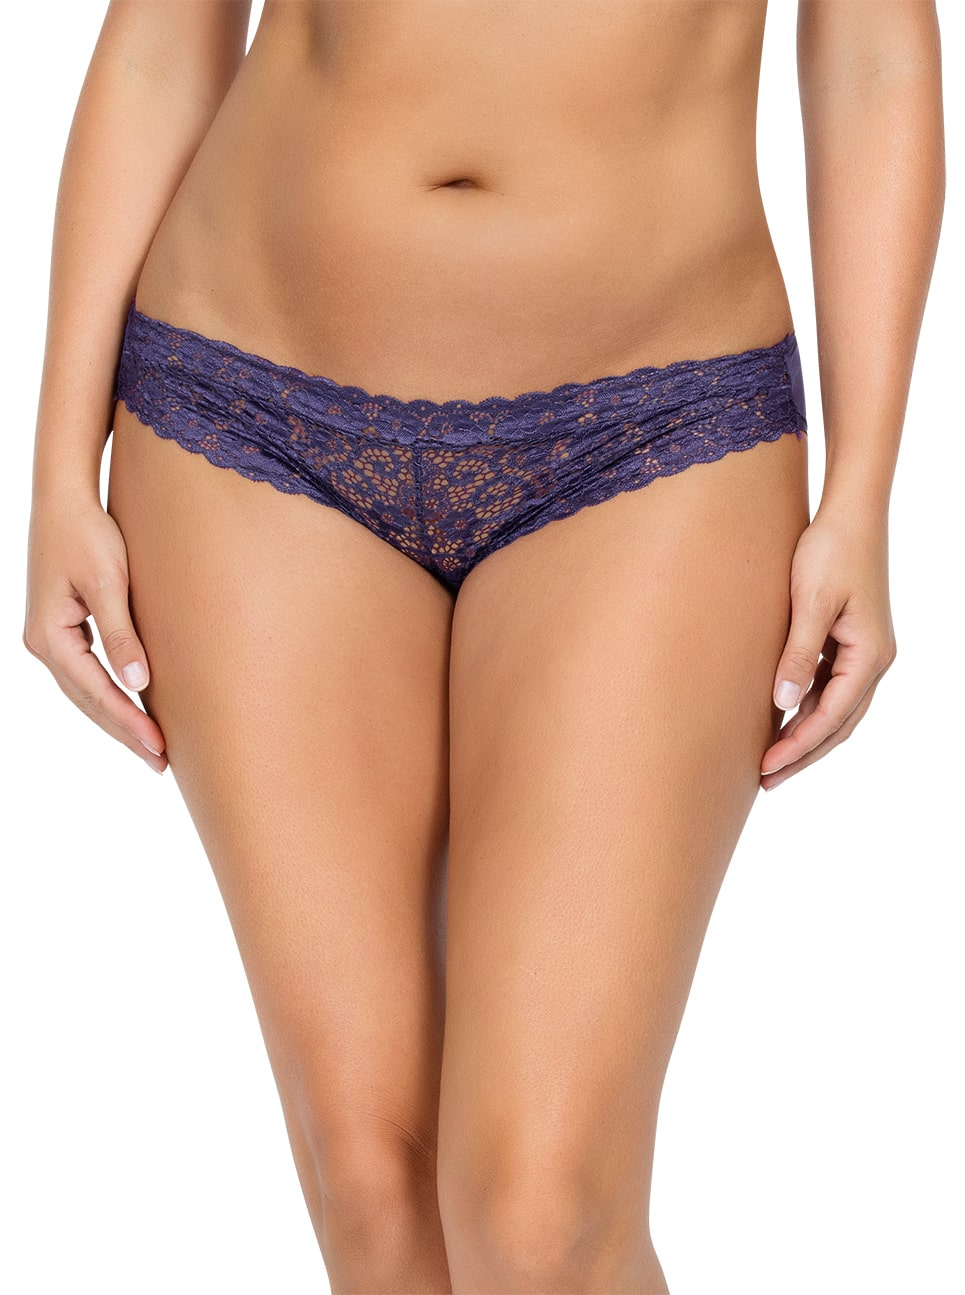 PARFAIT Adriana BikiniP5483 Mulberry Front - Adriana Bikini - Mulberry - P5483